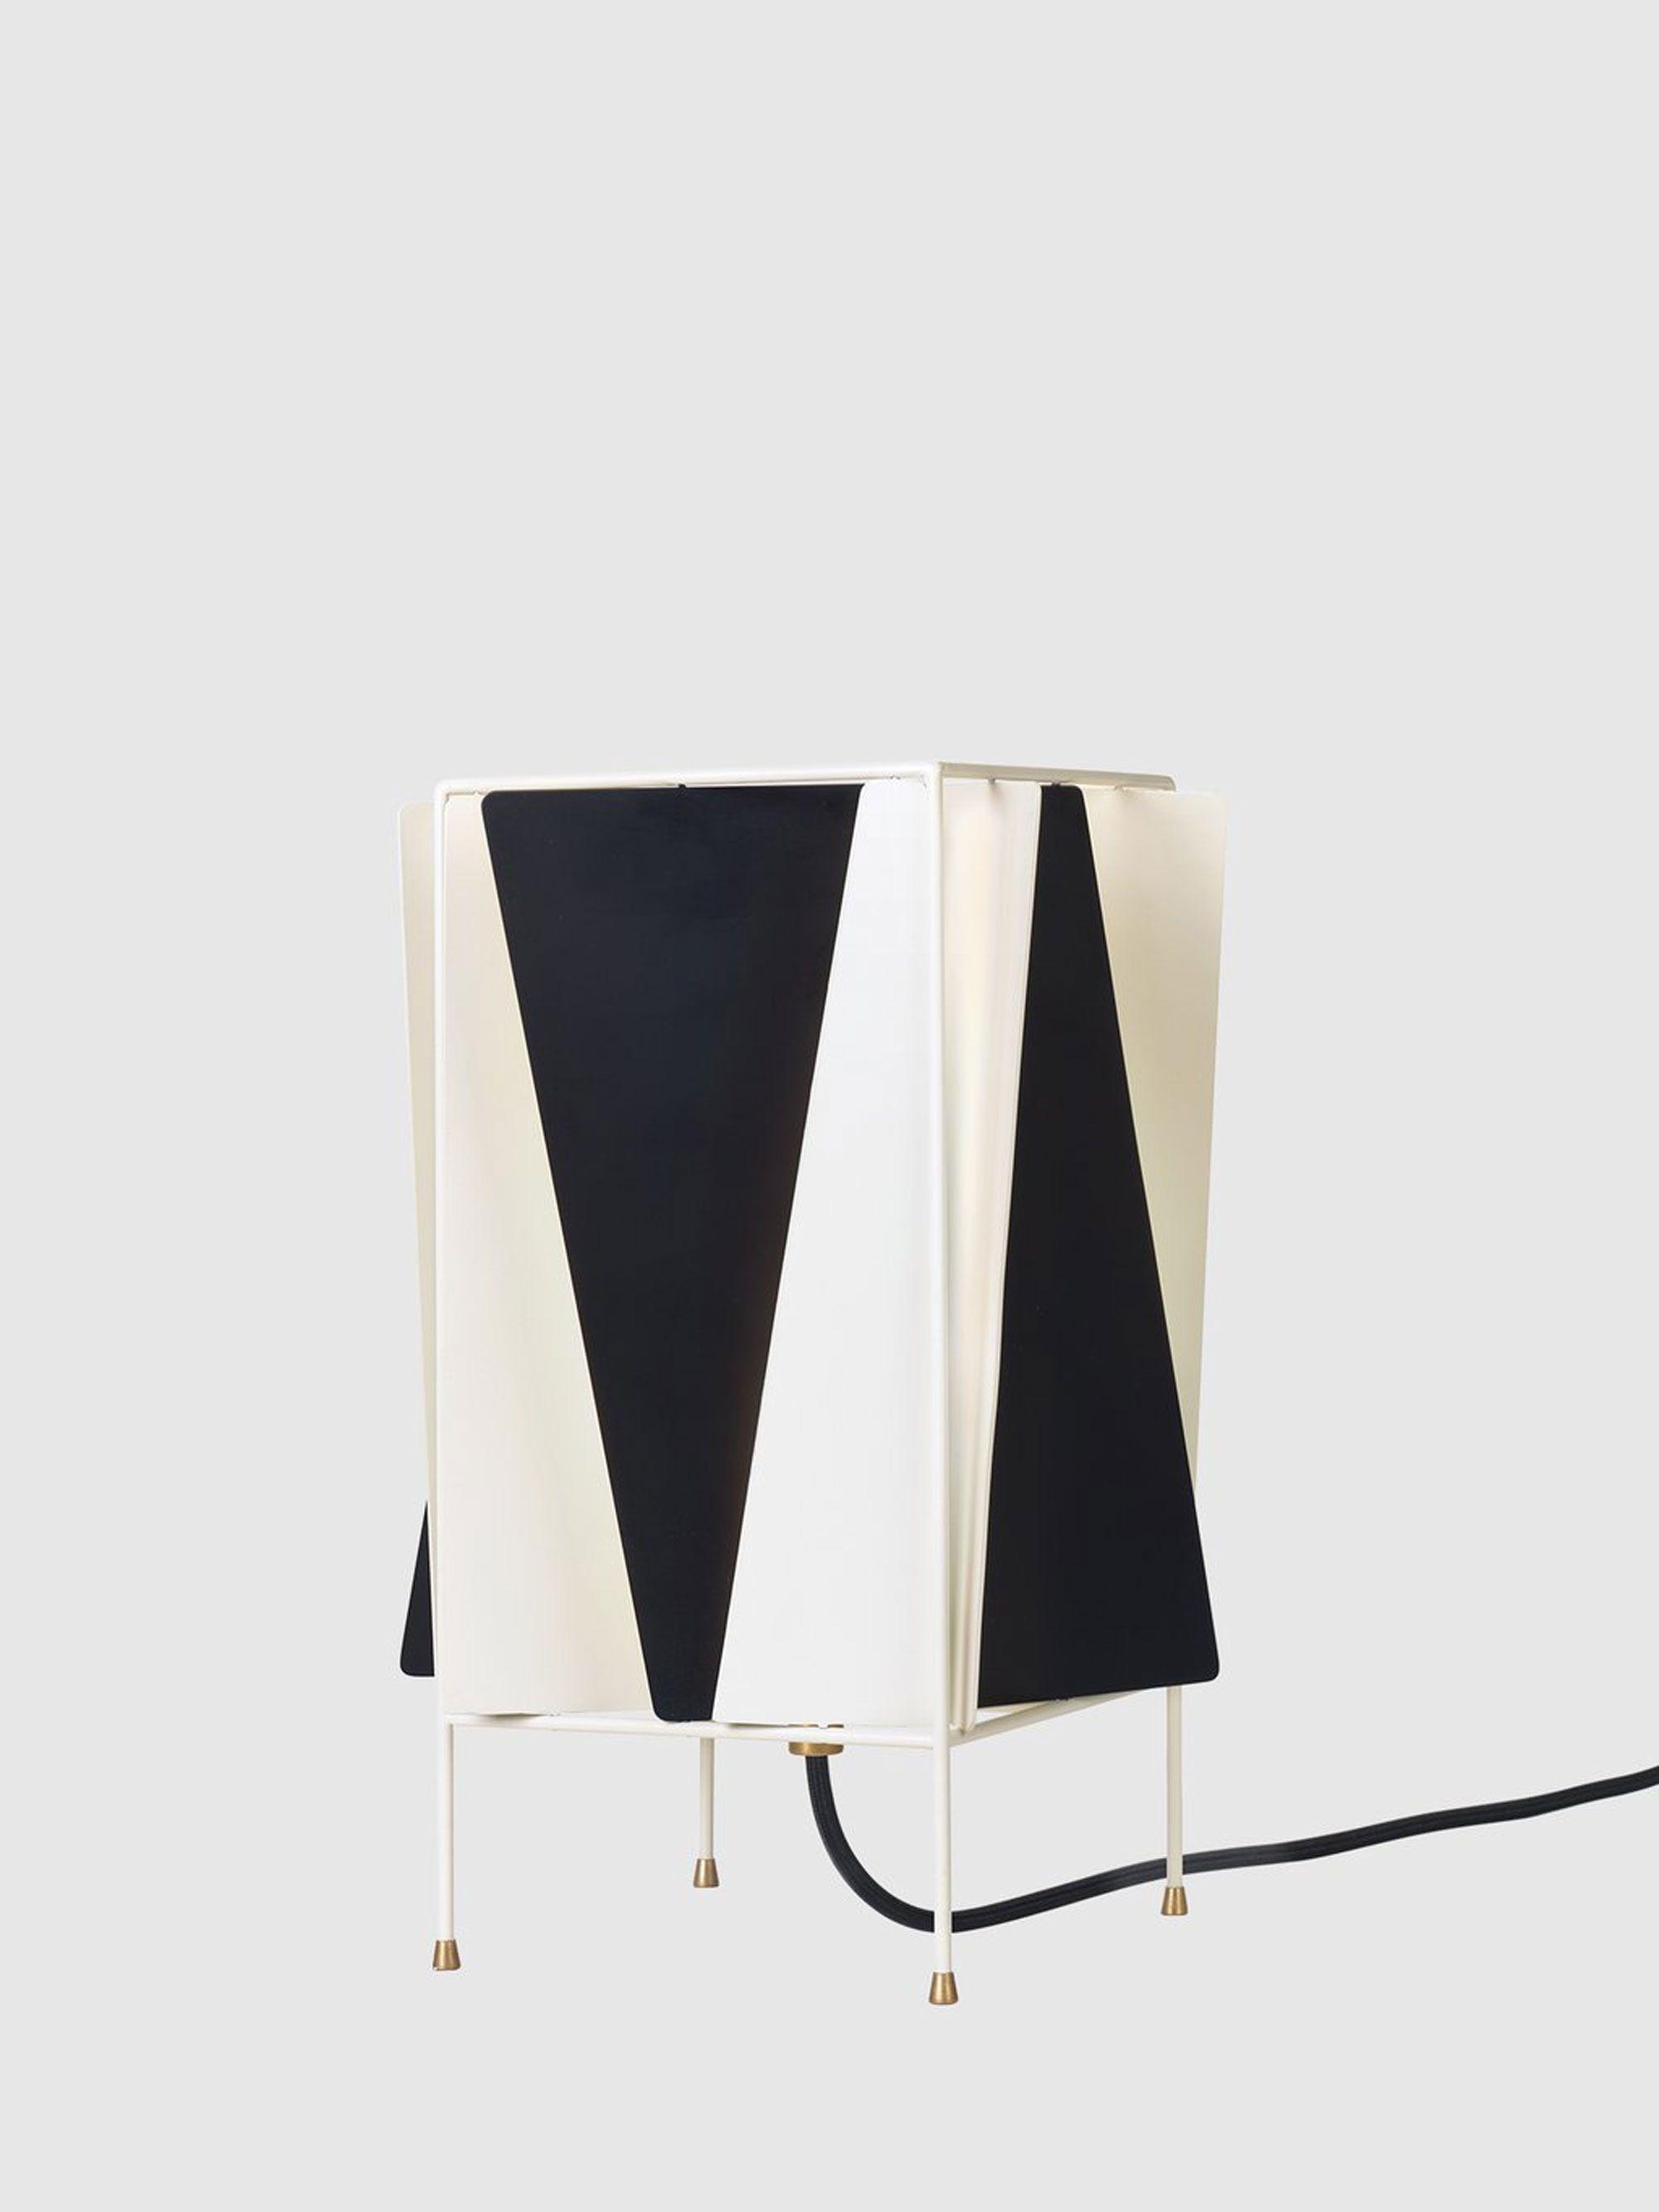 B 4 Table Lamp Black White Black Table Lamps Table Lamp Lamp